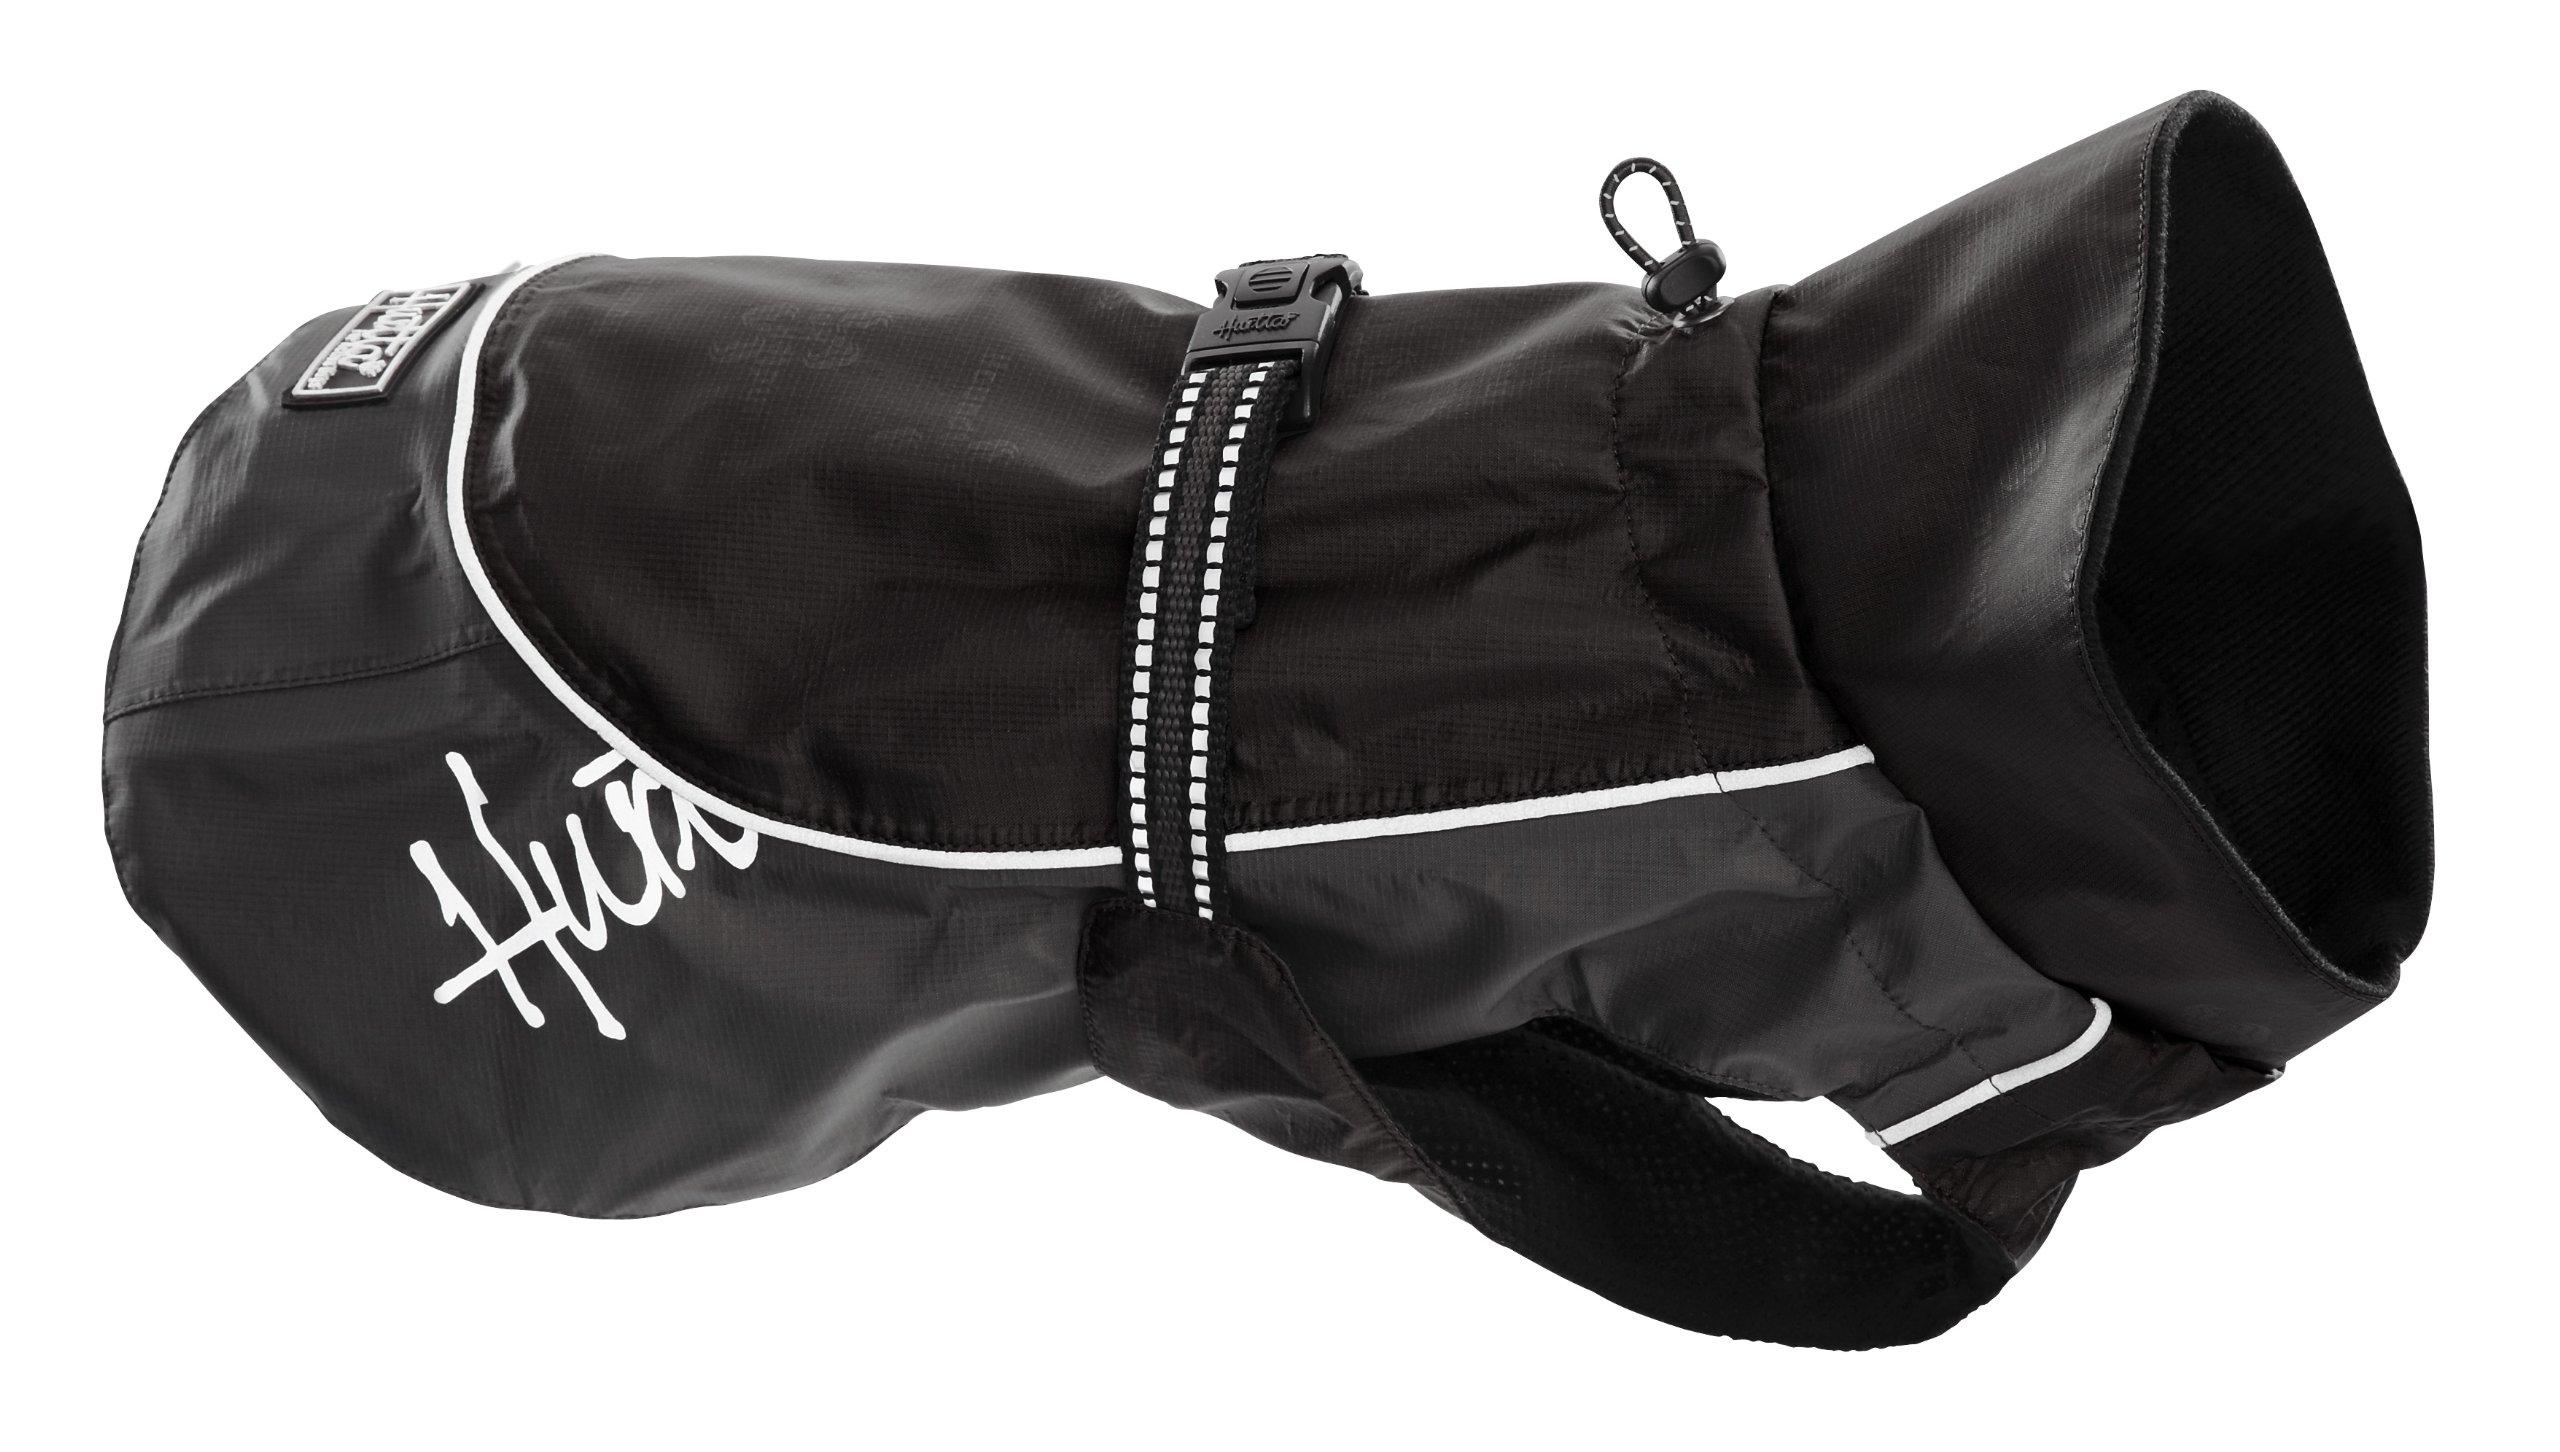 Hurtta Pet Collection 16-Inch Raincoat, Black